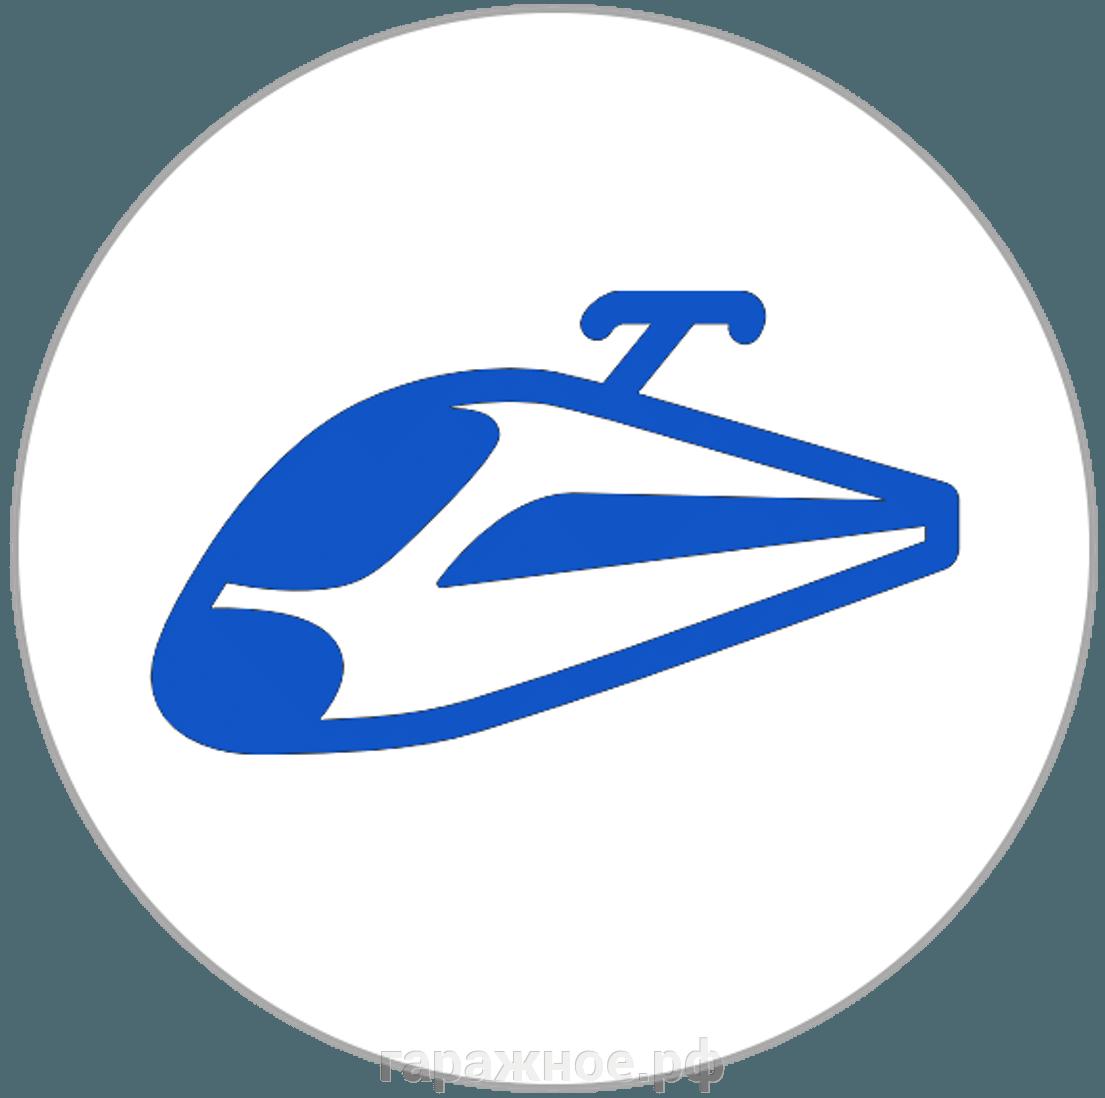 Зарядное устройство железнодорожная техника